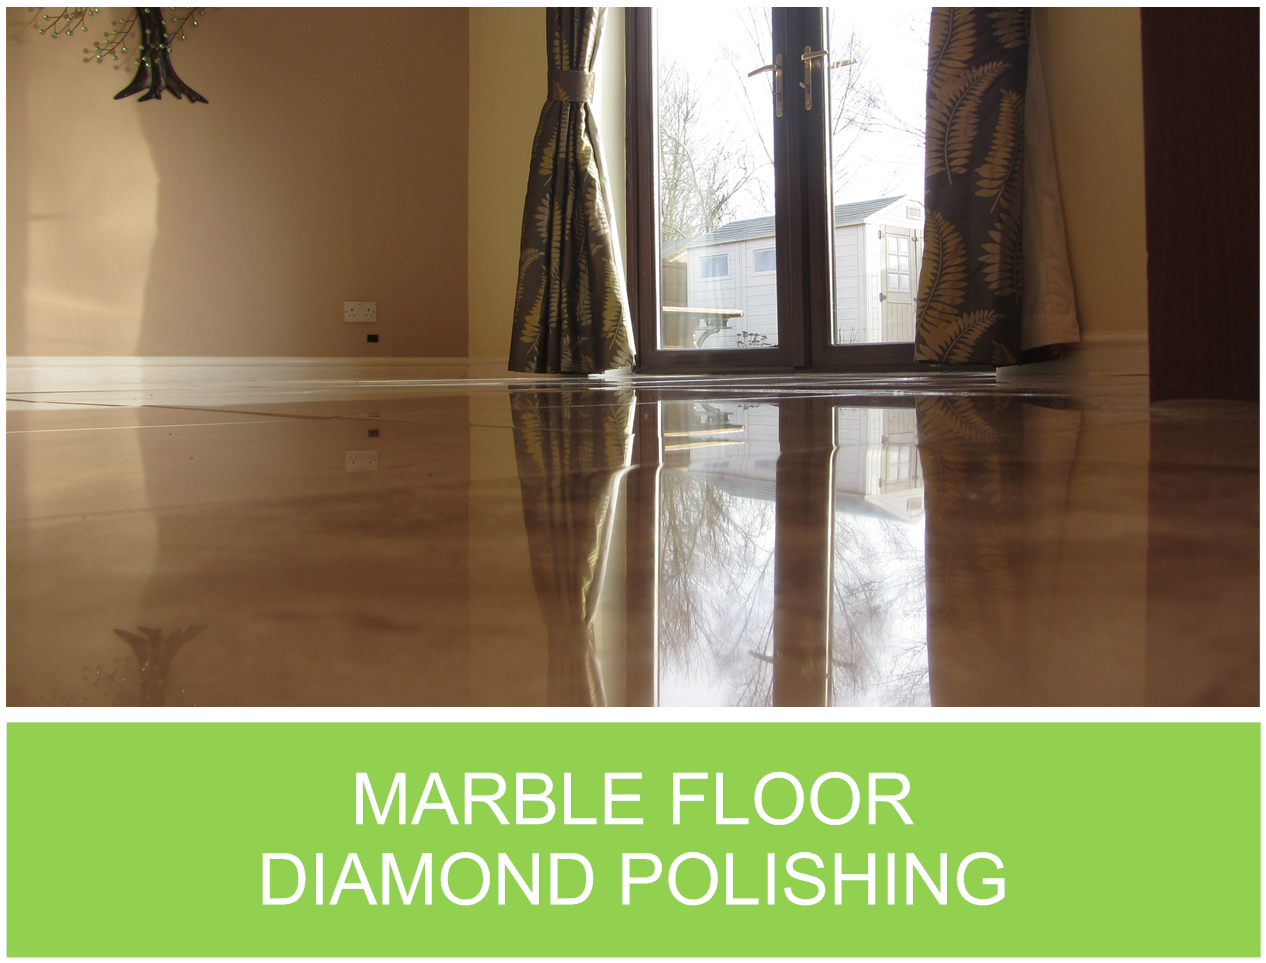 Marble Floor Cleaning Sealing Diamond Polishing High Shine